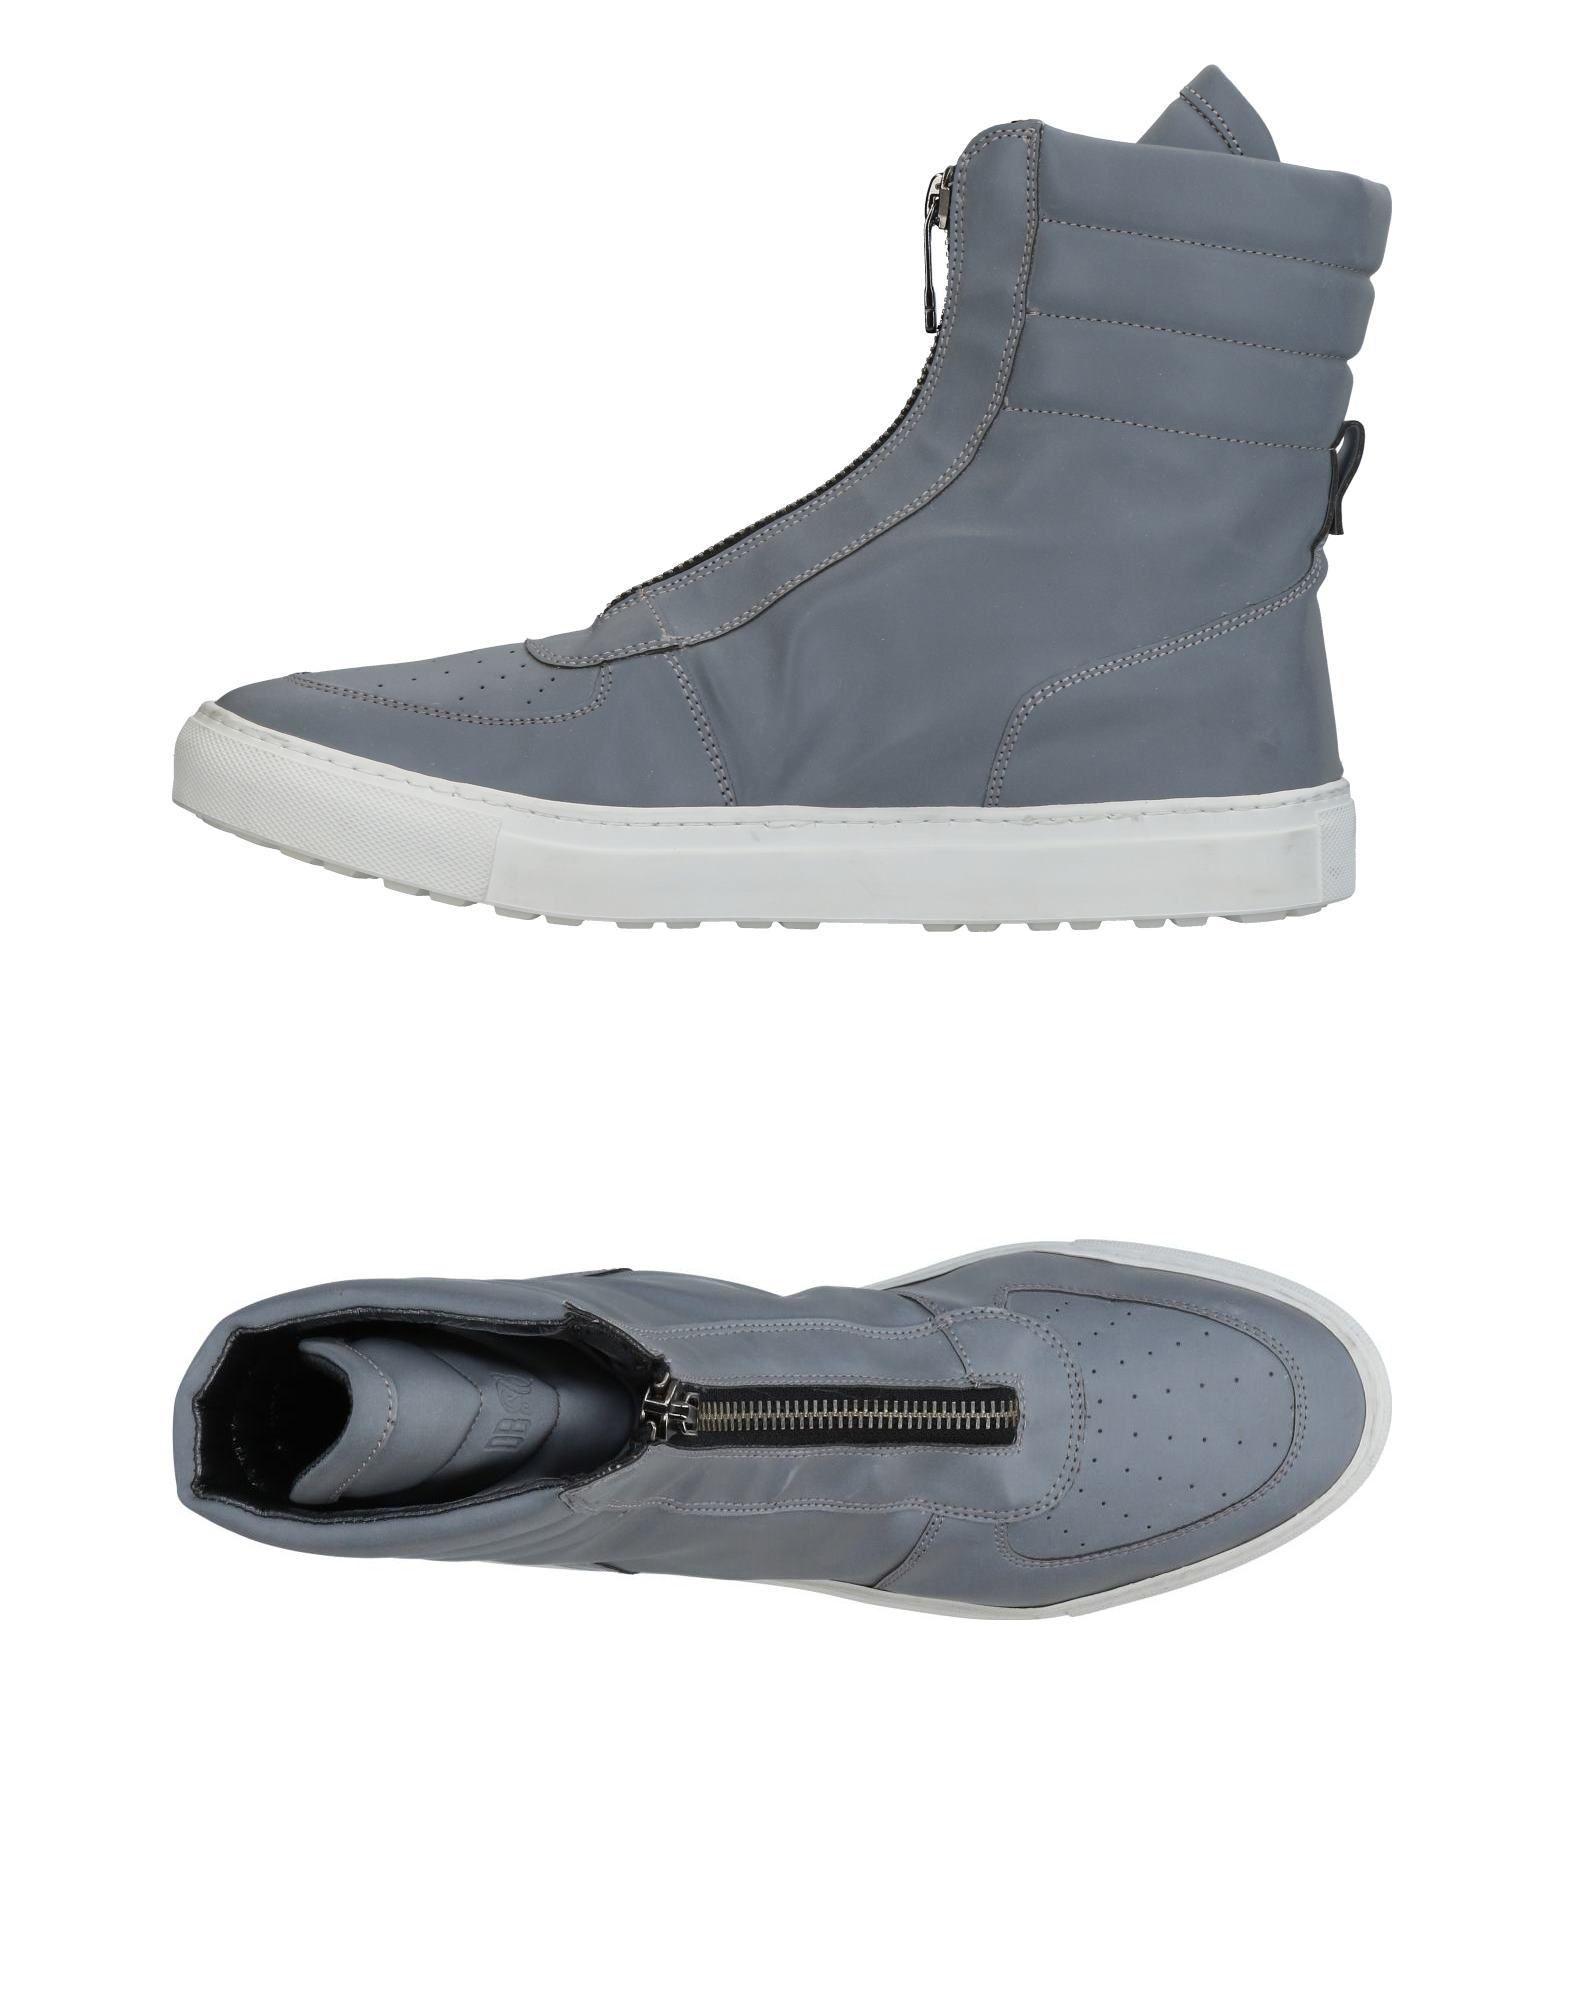 Sneakers Dirk Bikkembergs Uomo Uomo Uomo - 11461623XA 43b51d